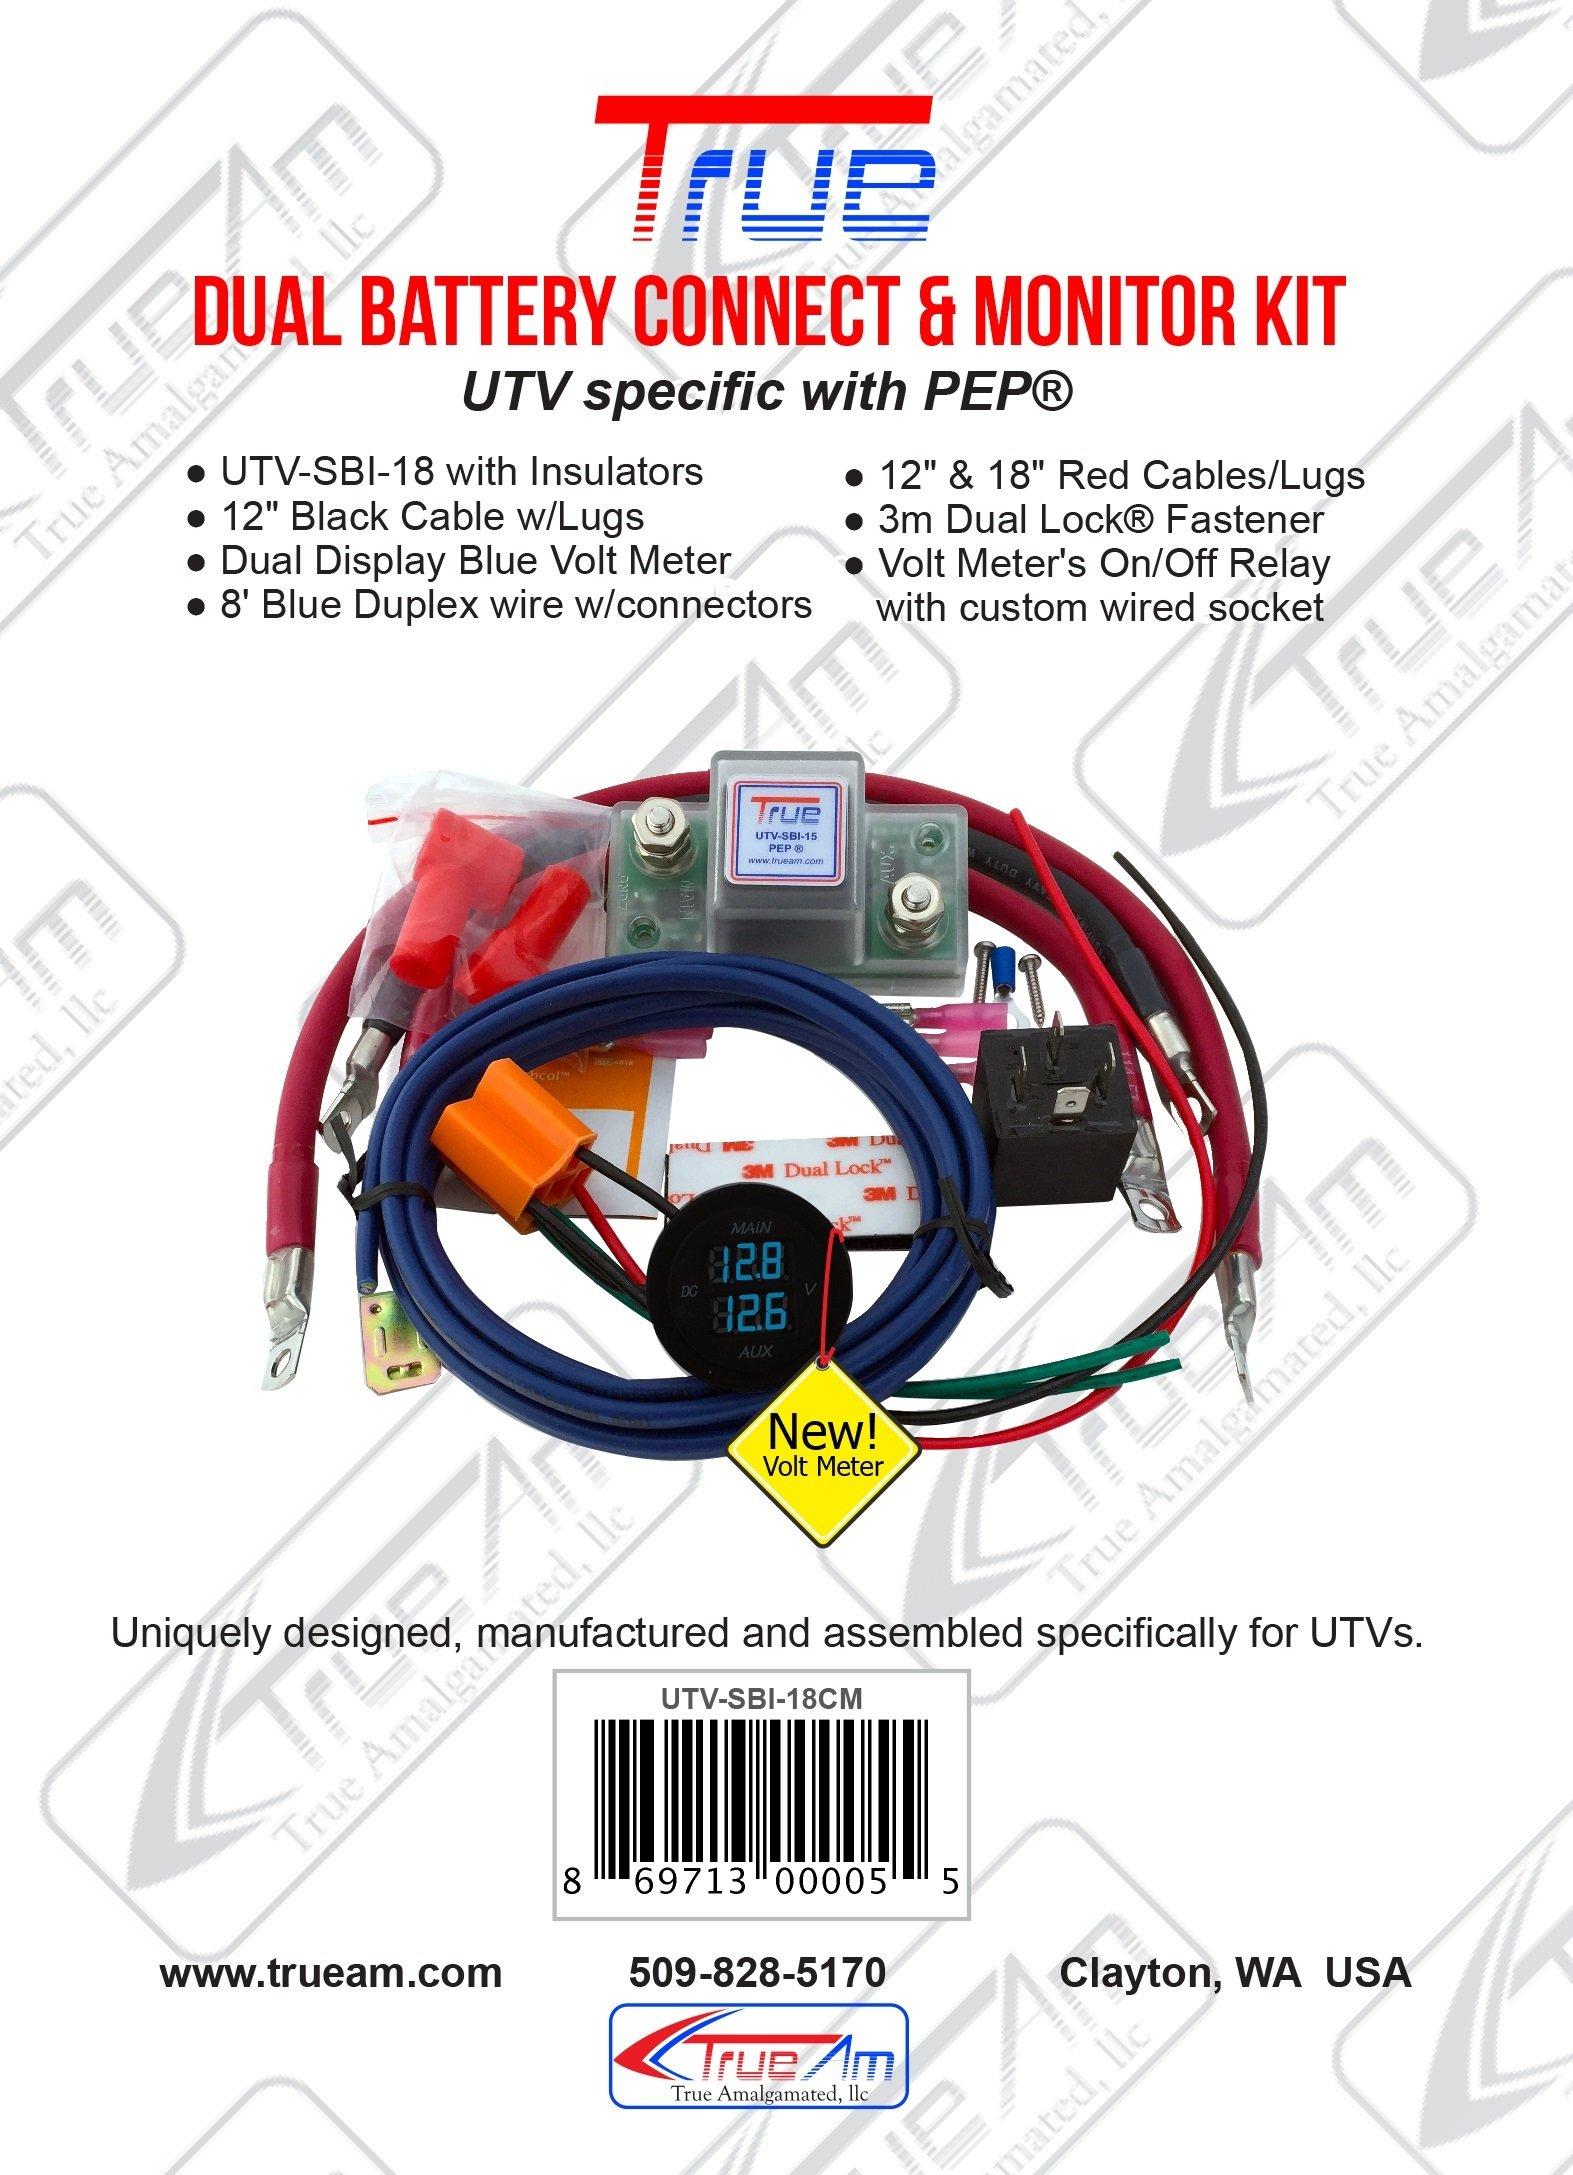 True UTV-SBI-15CM UTV Dual Battery Connect & Monitor Kit by True Decor (Image #1)